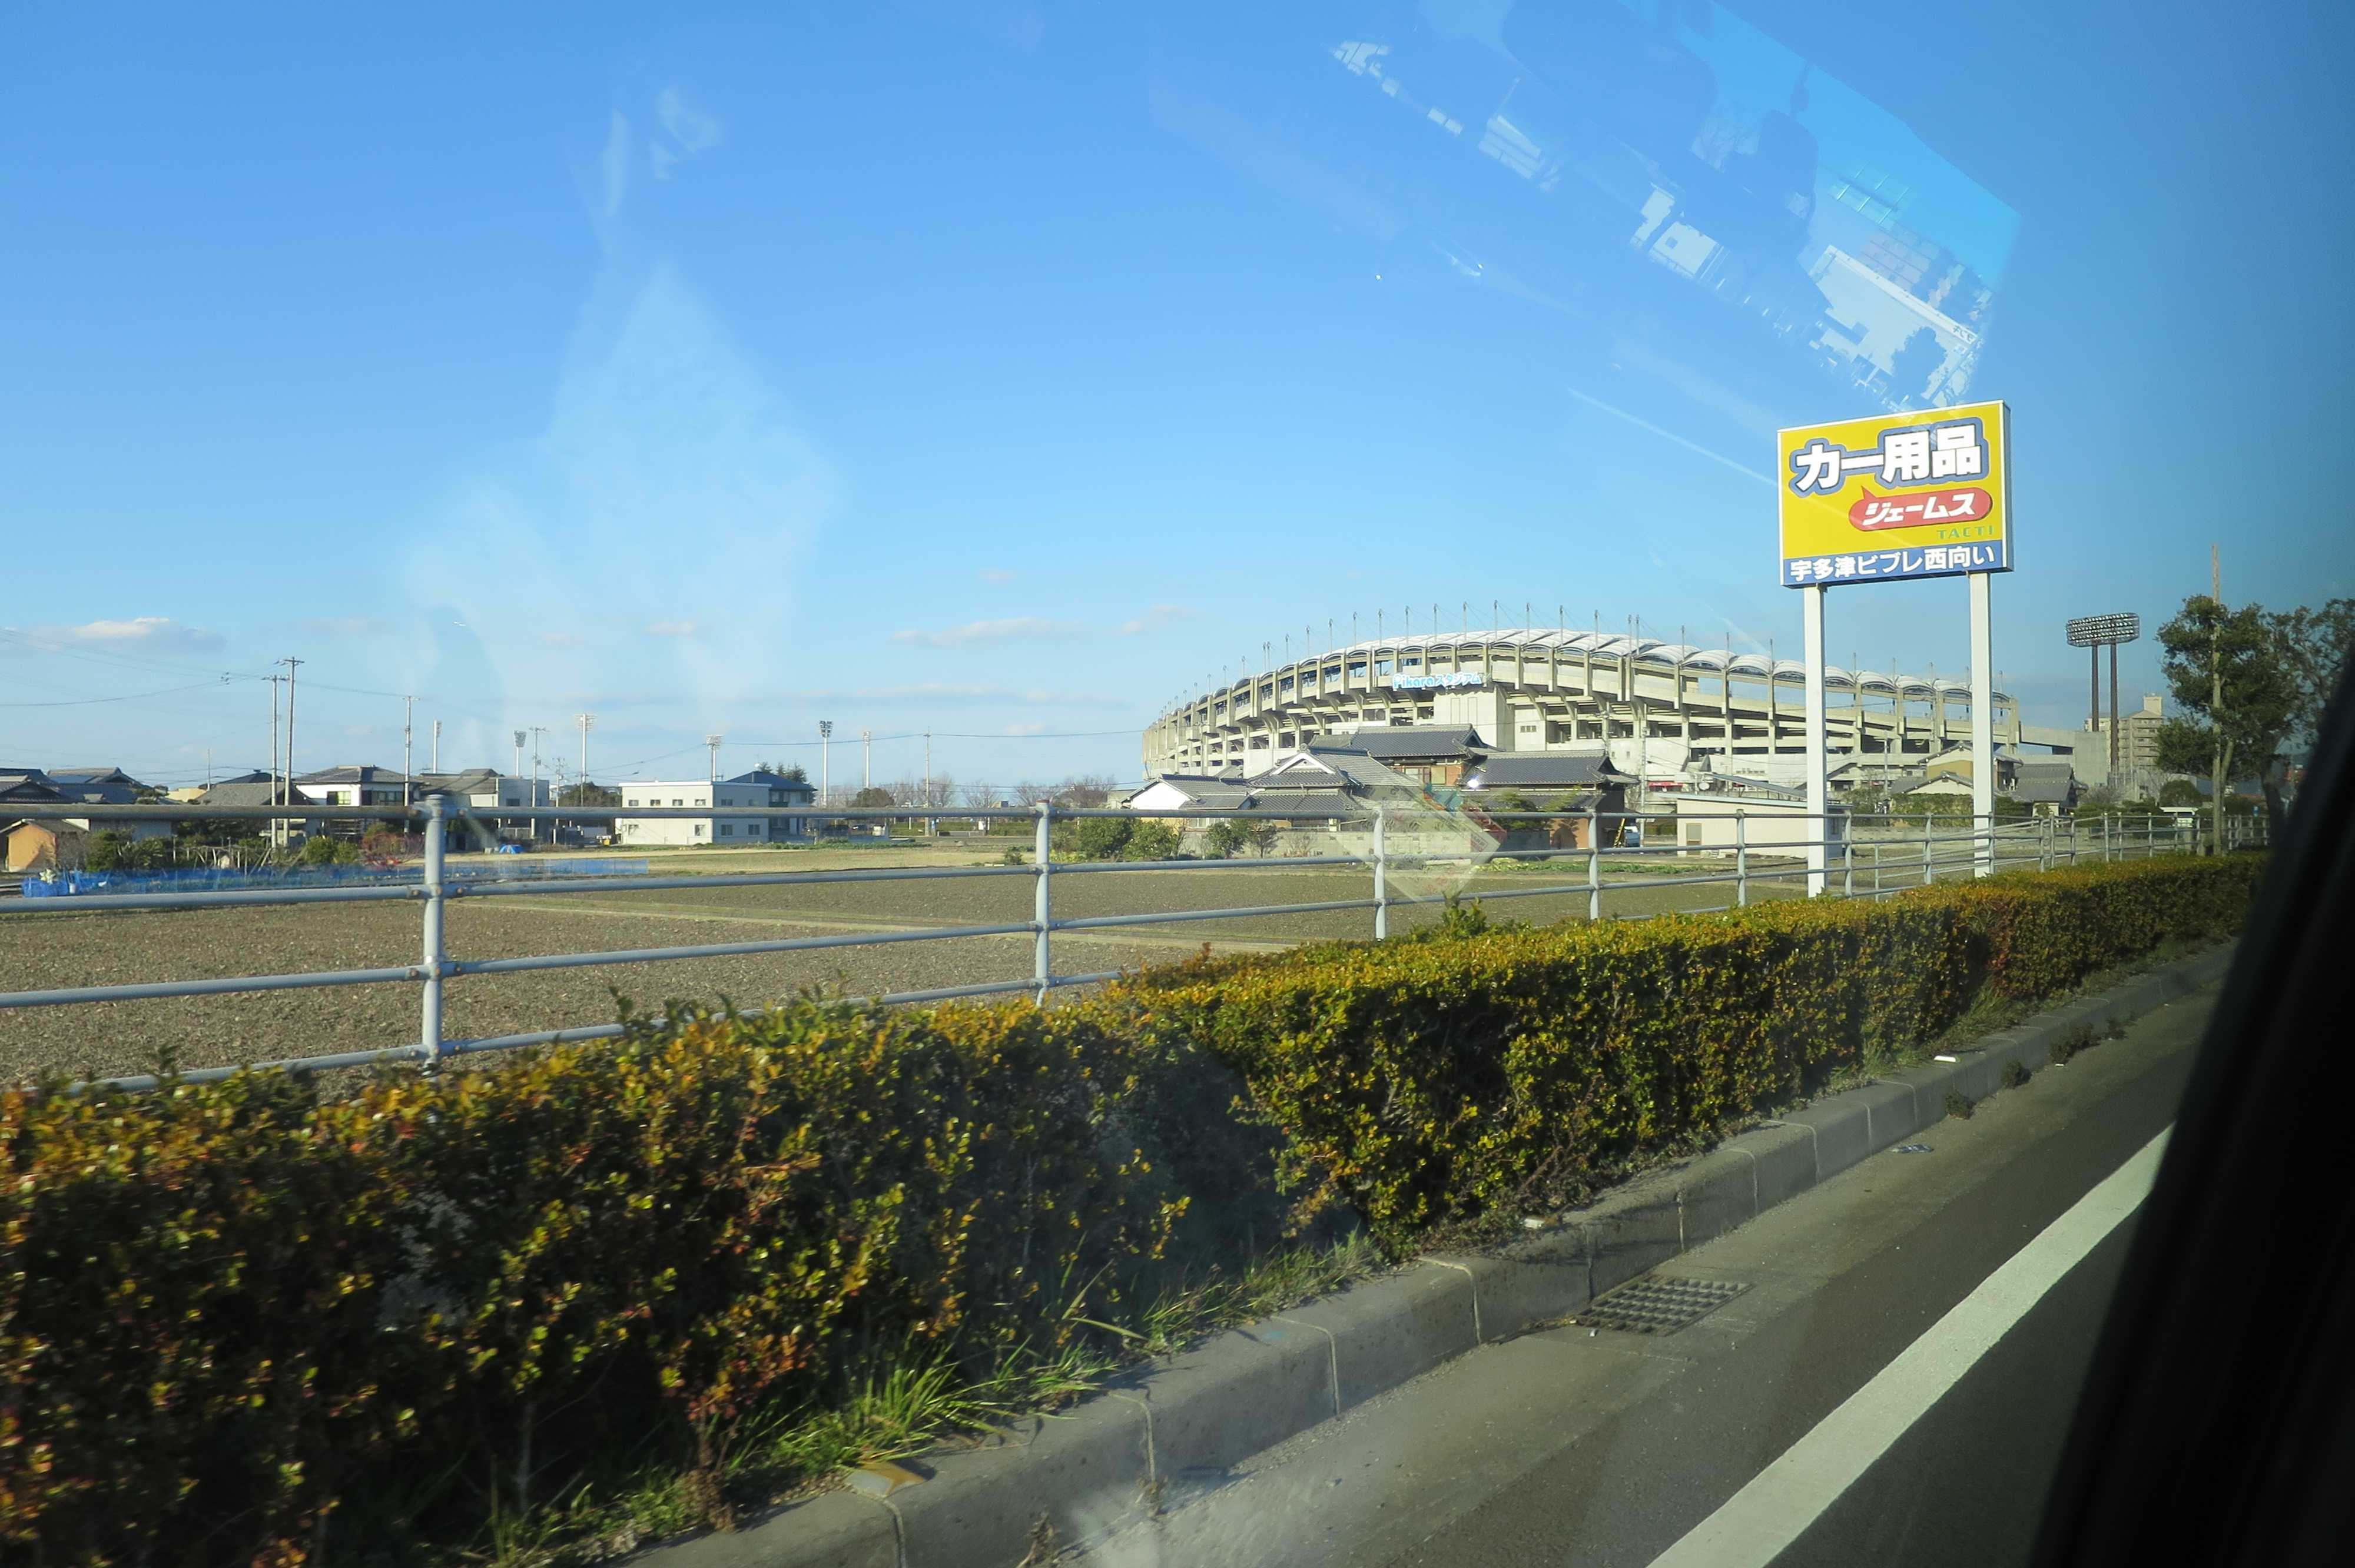 Pikaraスタジアム(香川県立丸亀競技場)